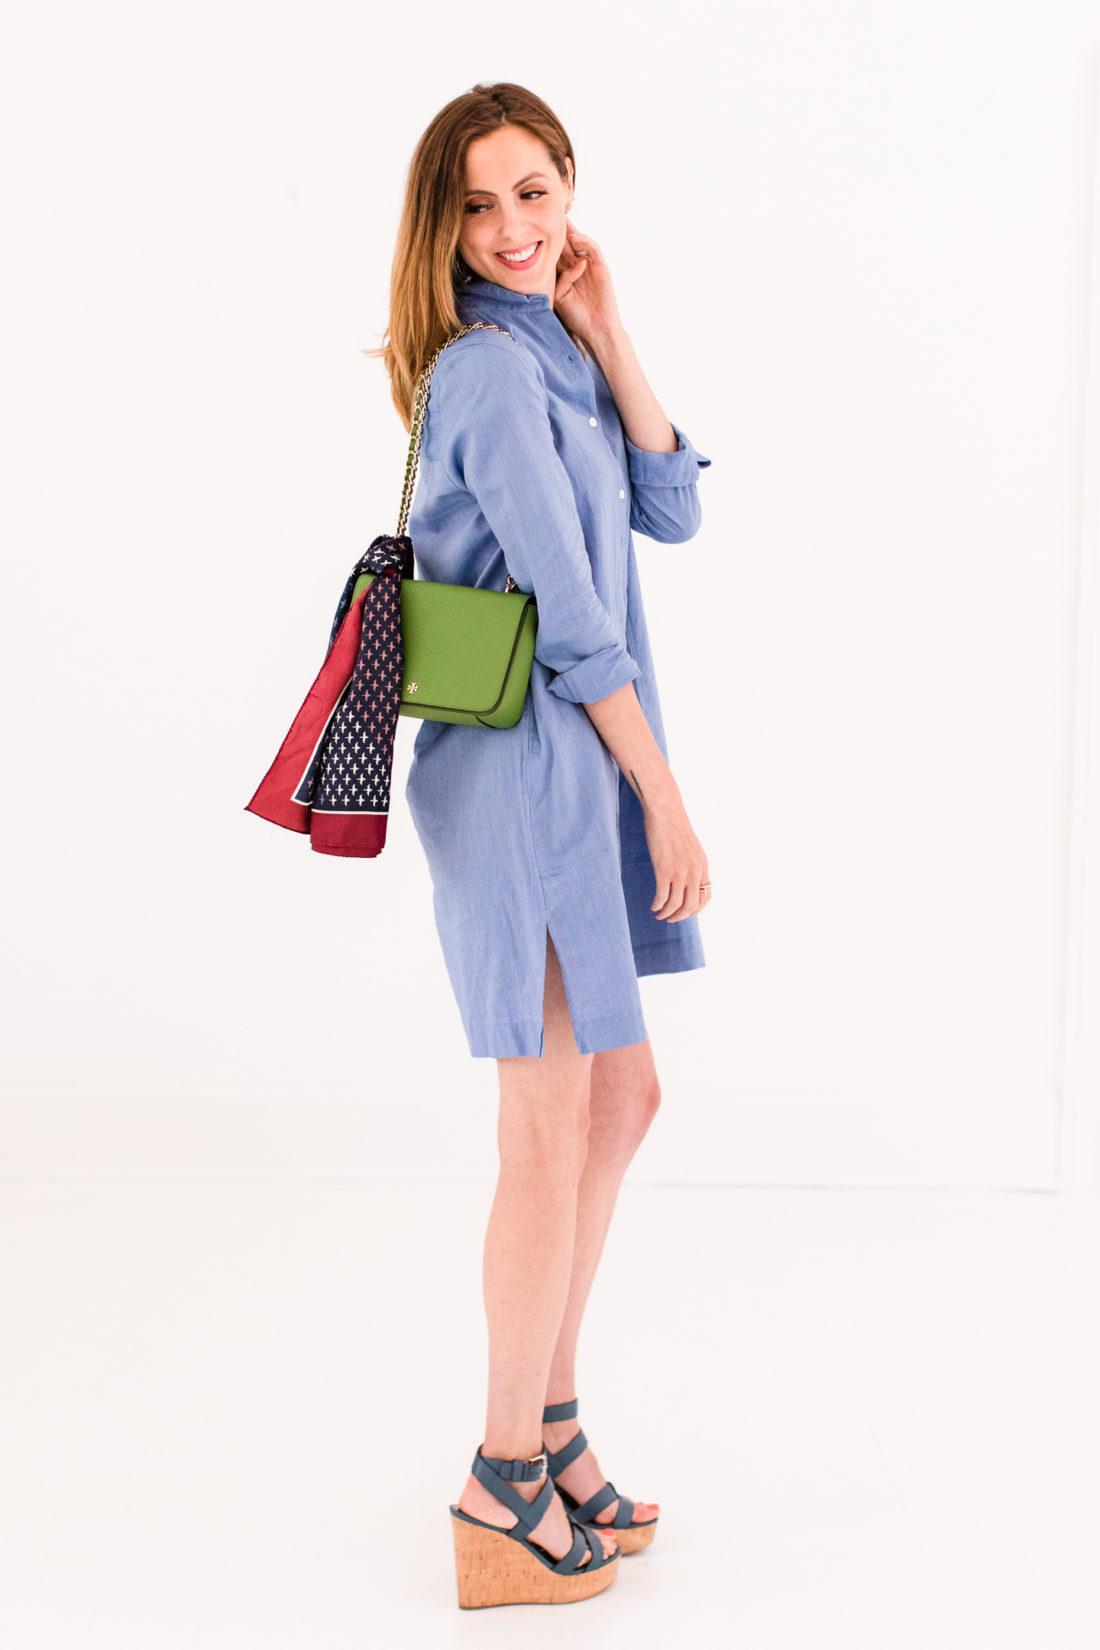 Eva Amurri Martino wears a light blue shirt dress and a green tory burch bag with a printed scarf tied around it